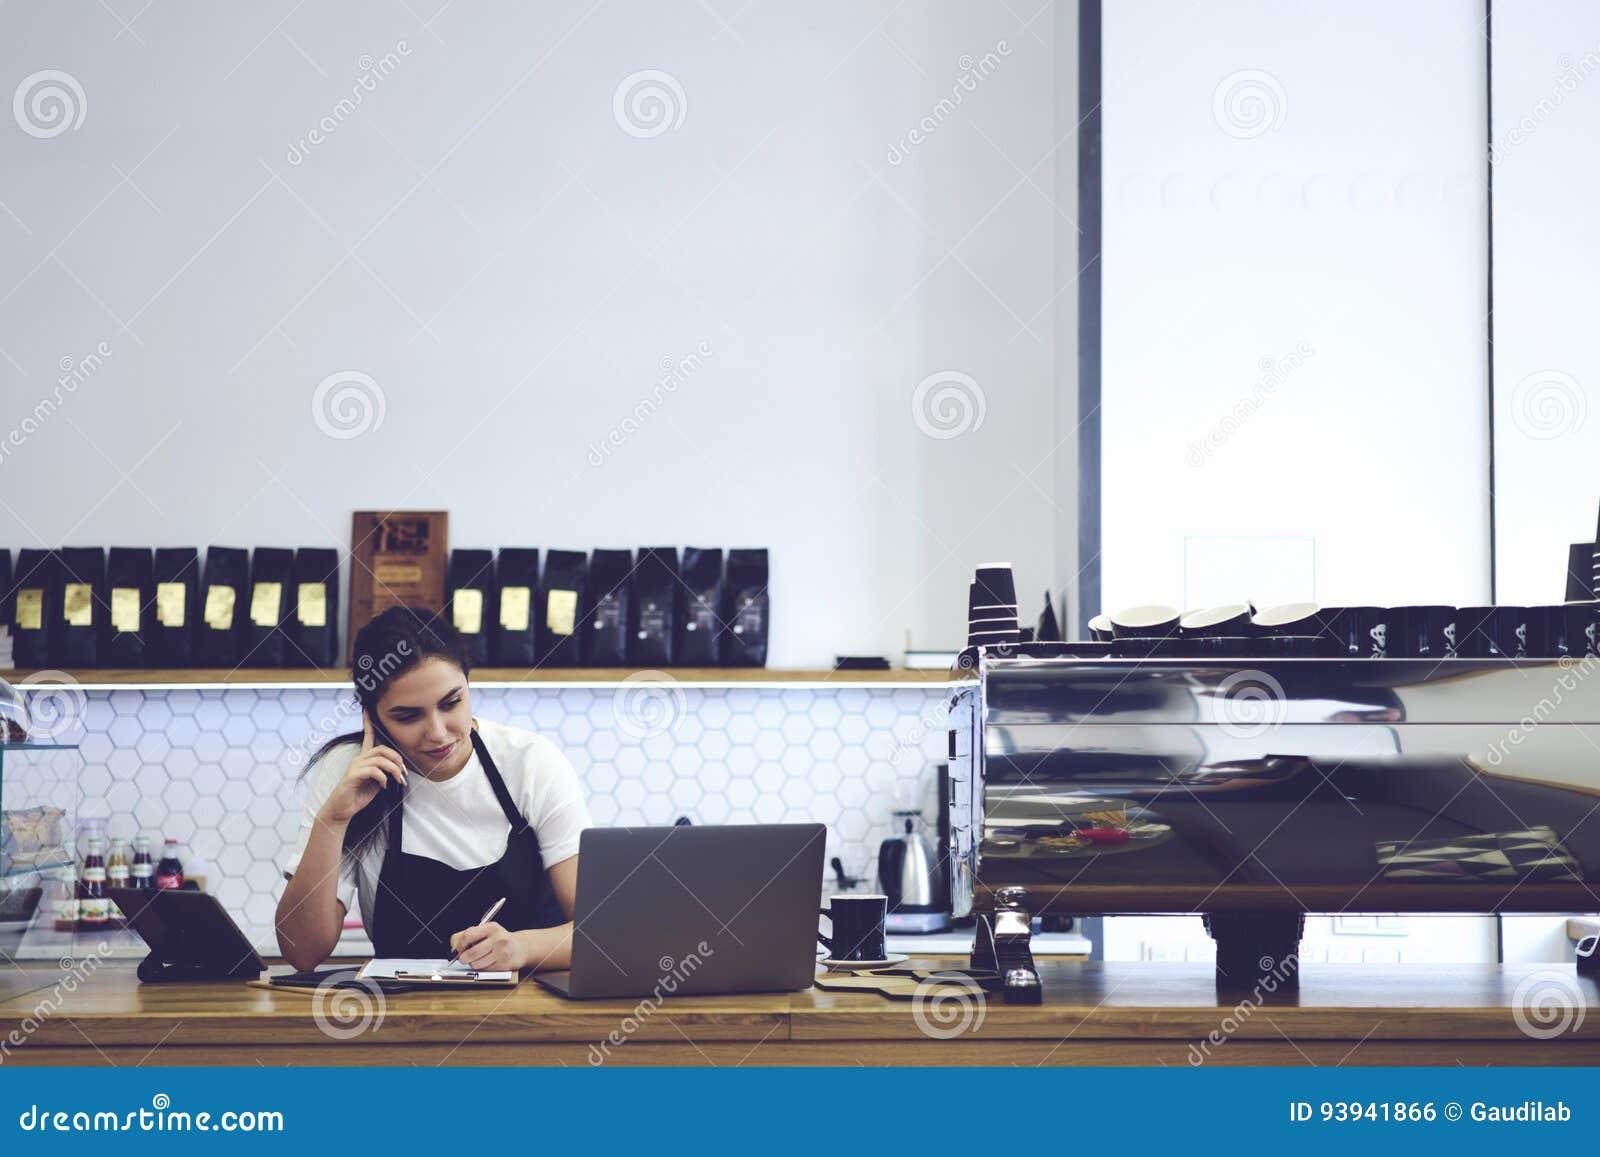 Portrait of attractive female barista working in cafeteria